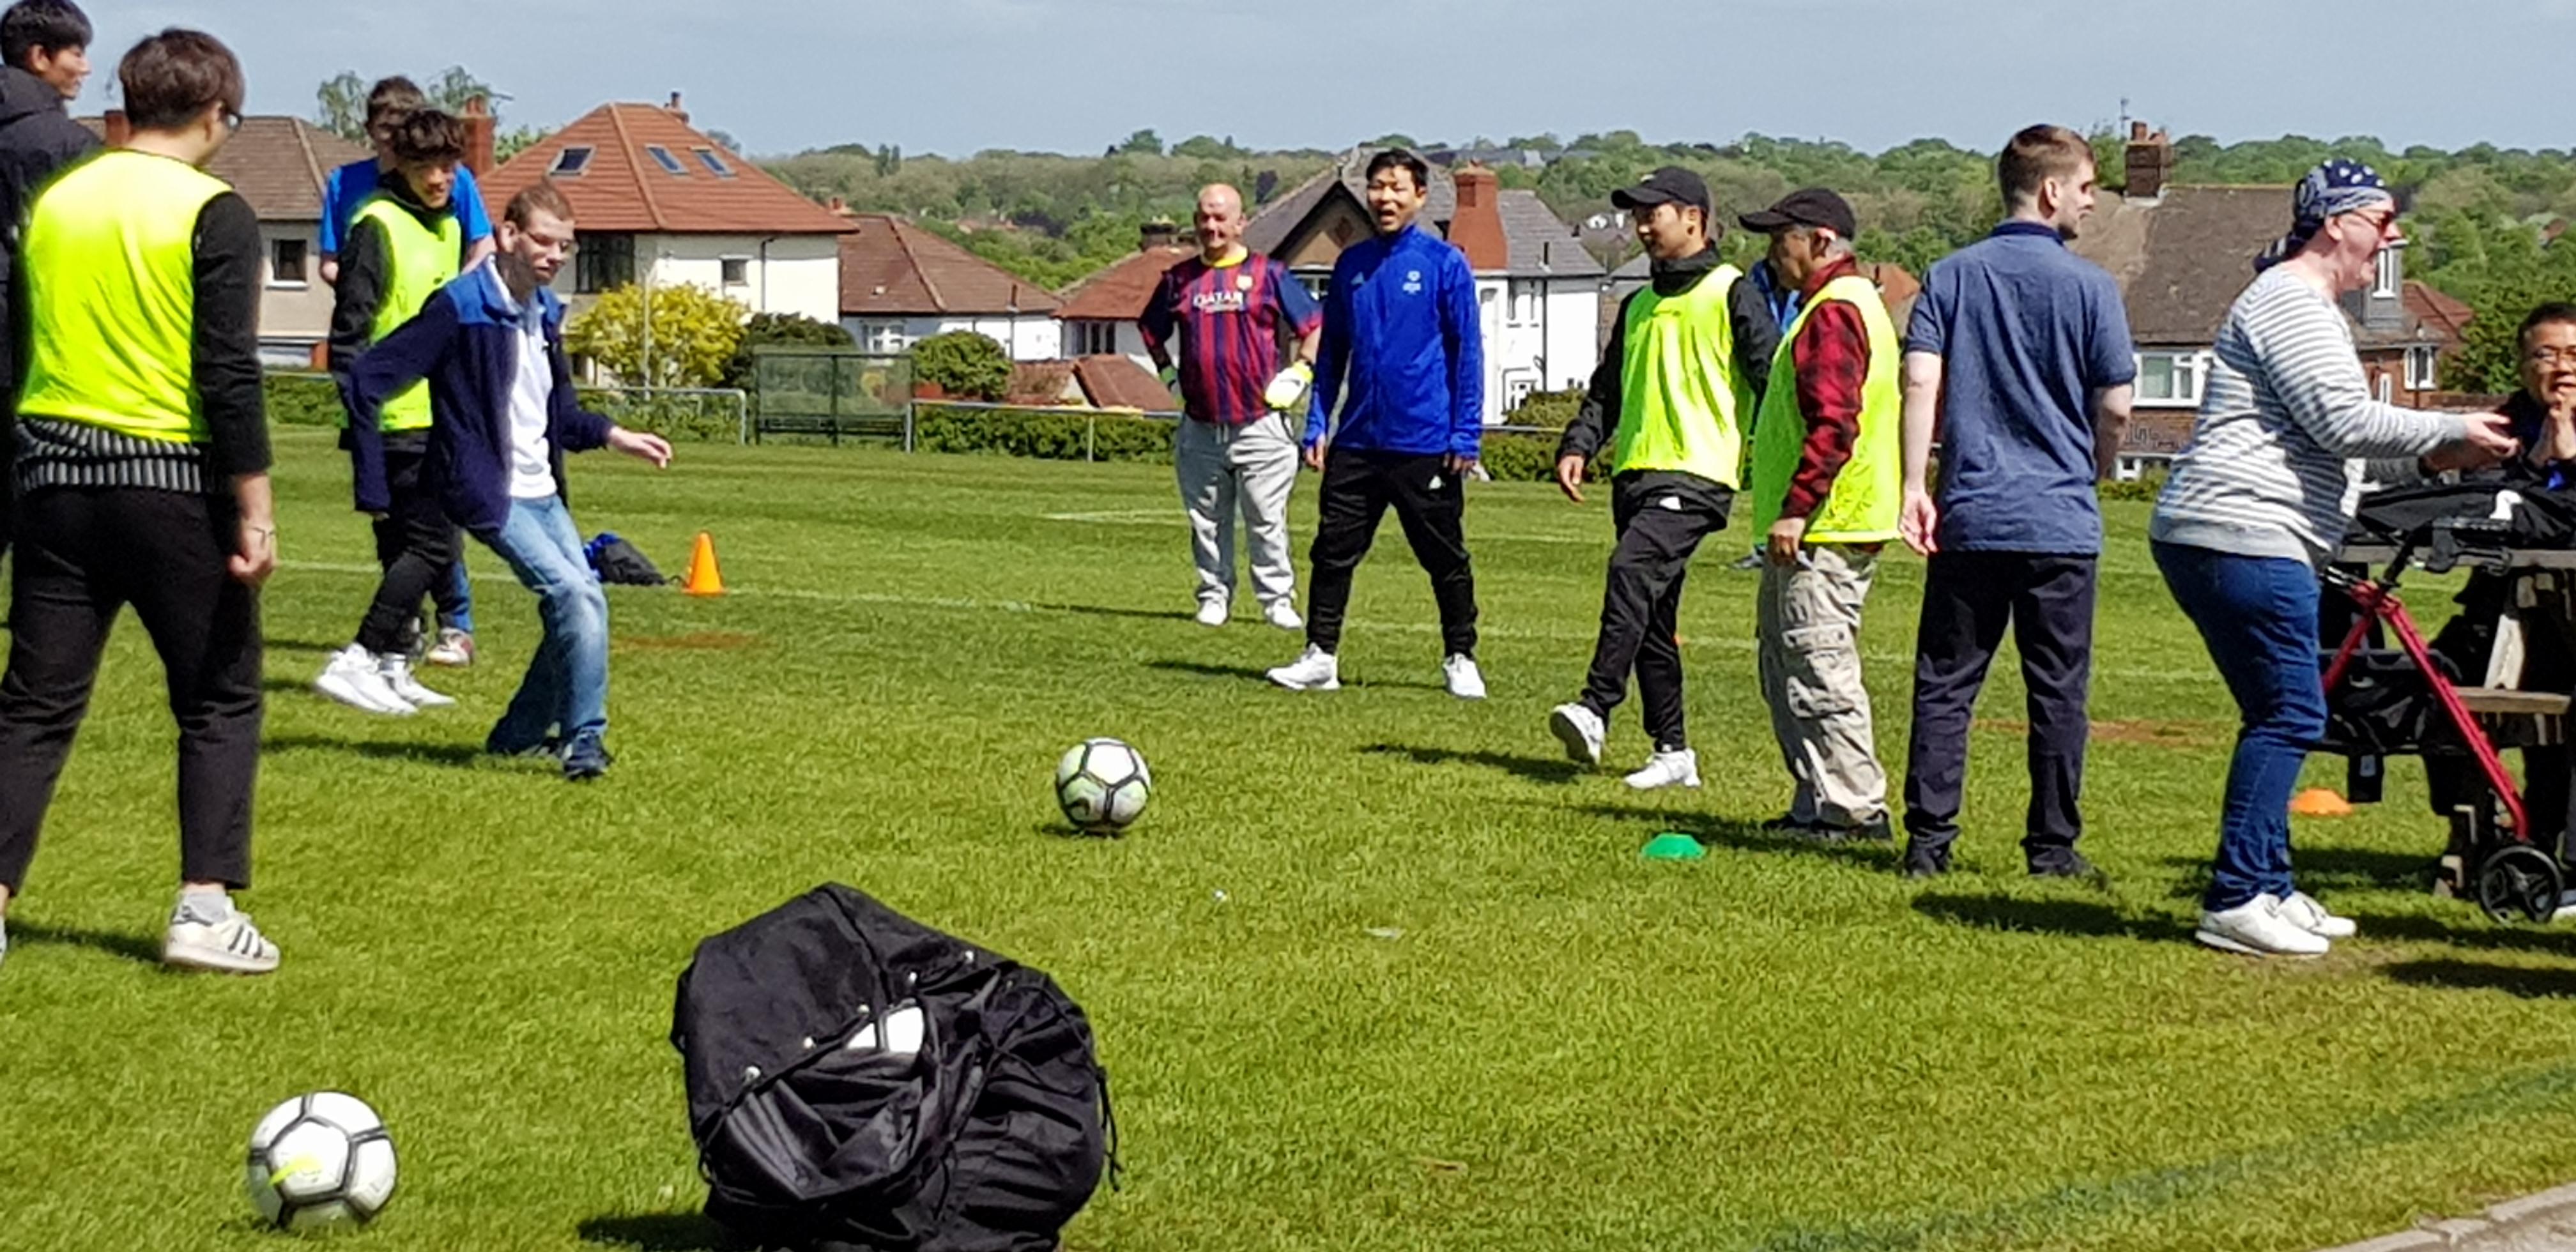 welcomekorean youth team